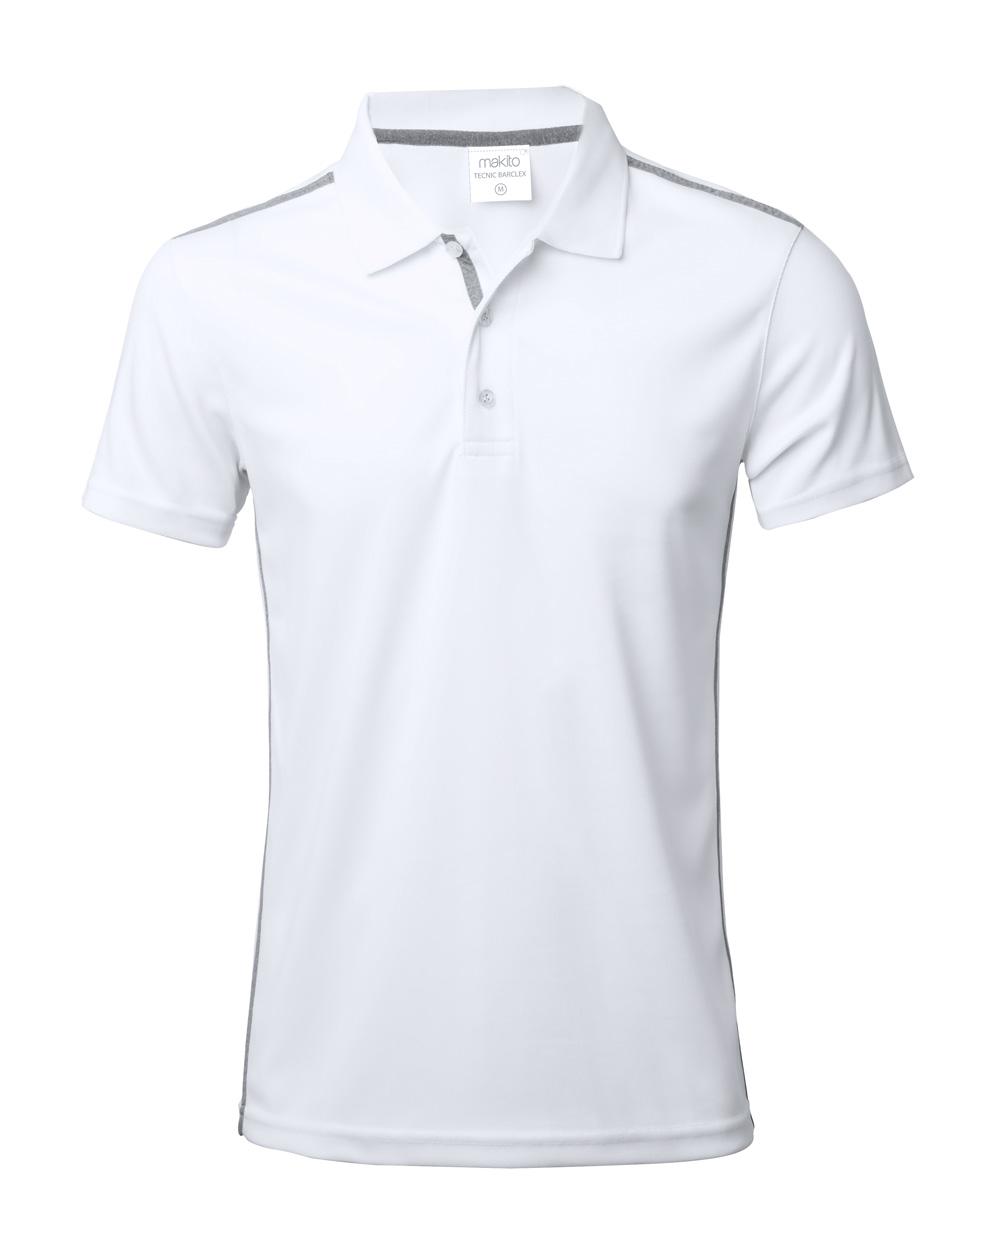 Tecnic Barclex sport polo shirt